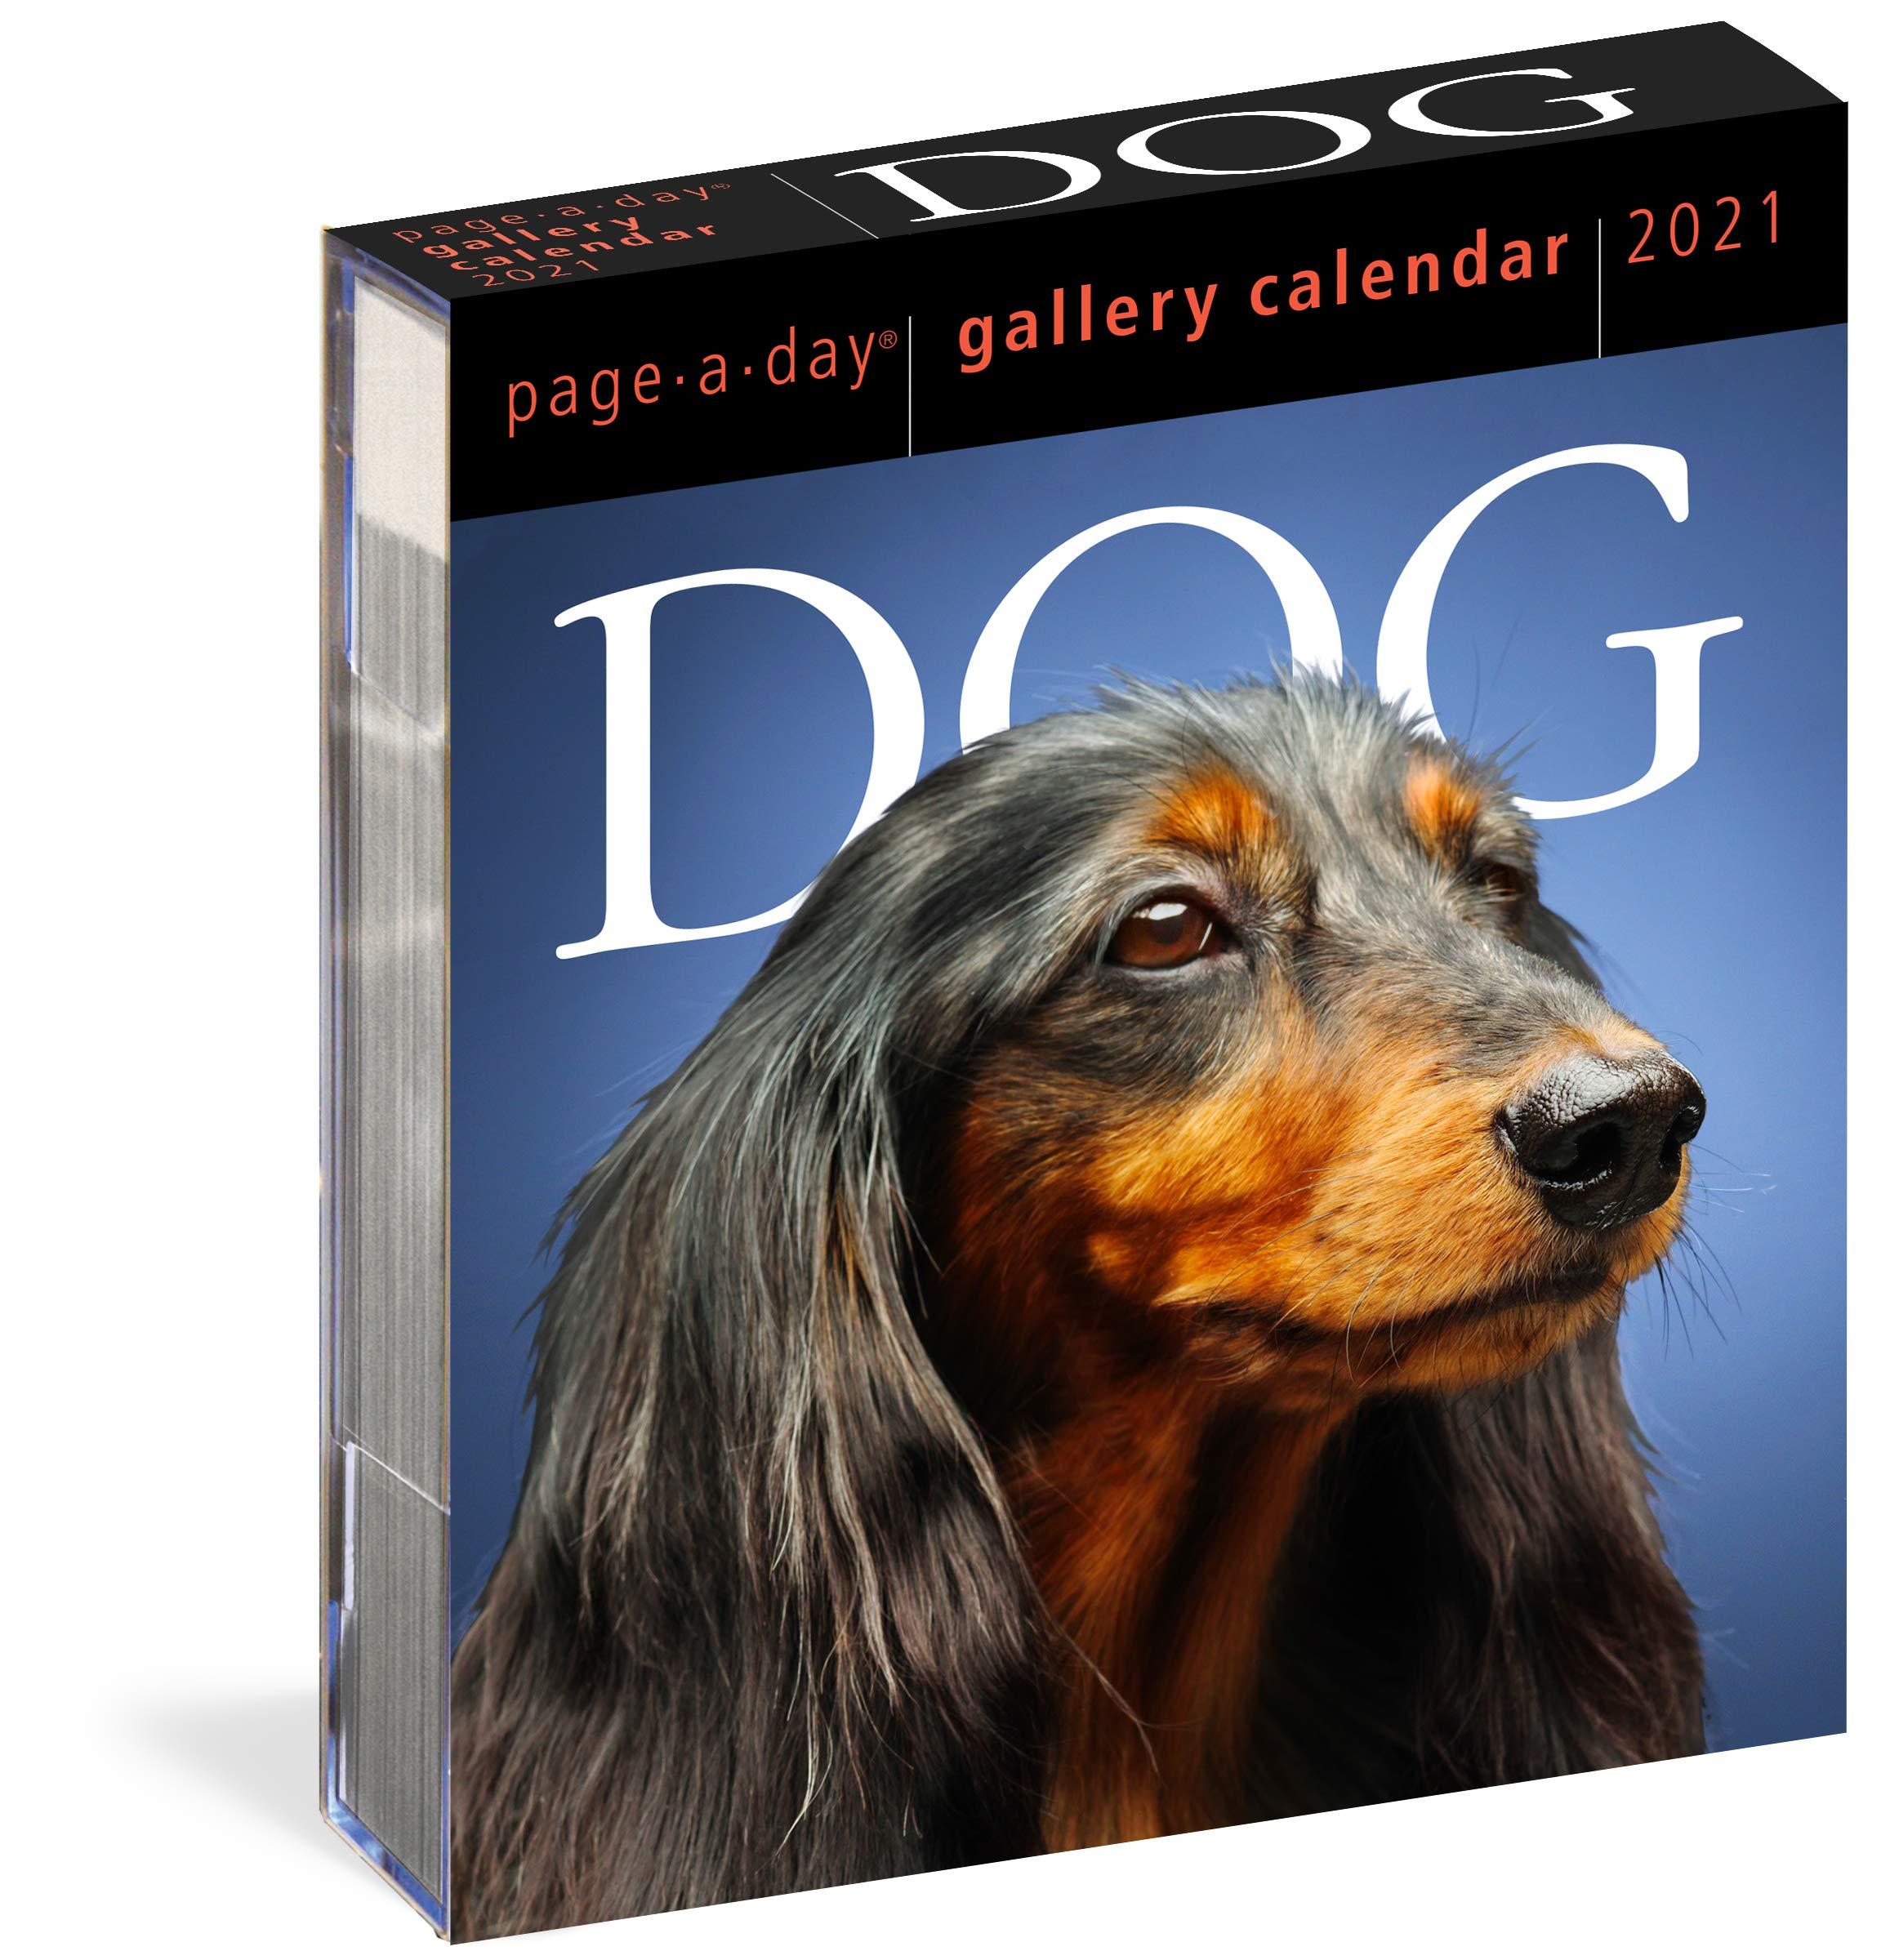 Dog Calendar 2021 Amazon.com: Dog Page A Day Gallery Calendar 2021 (9781523508976